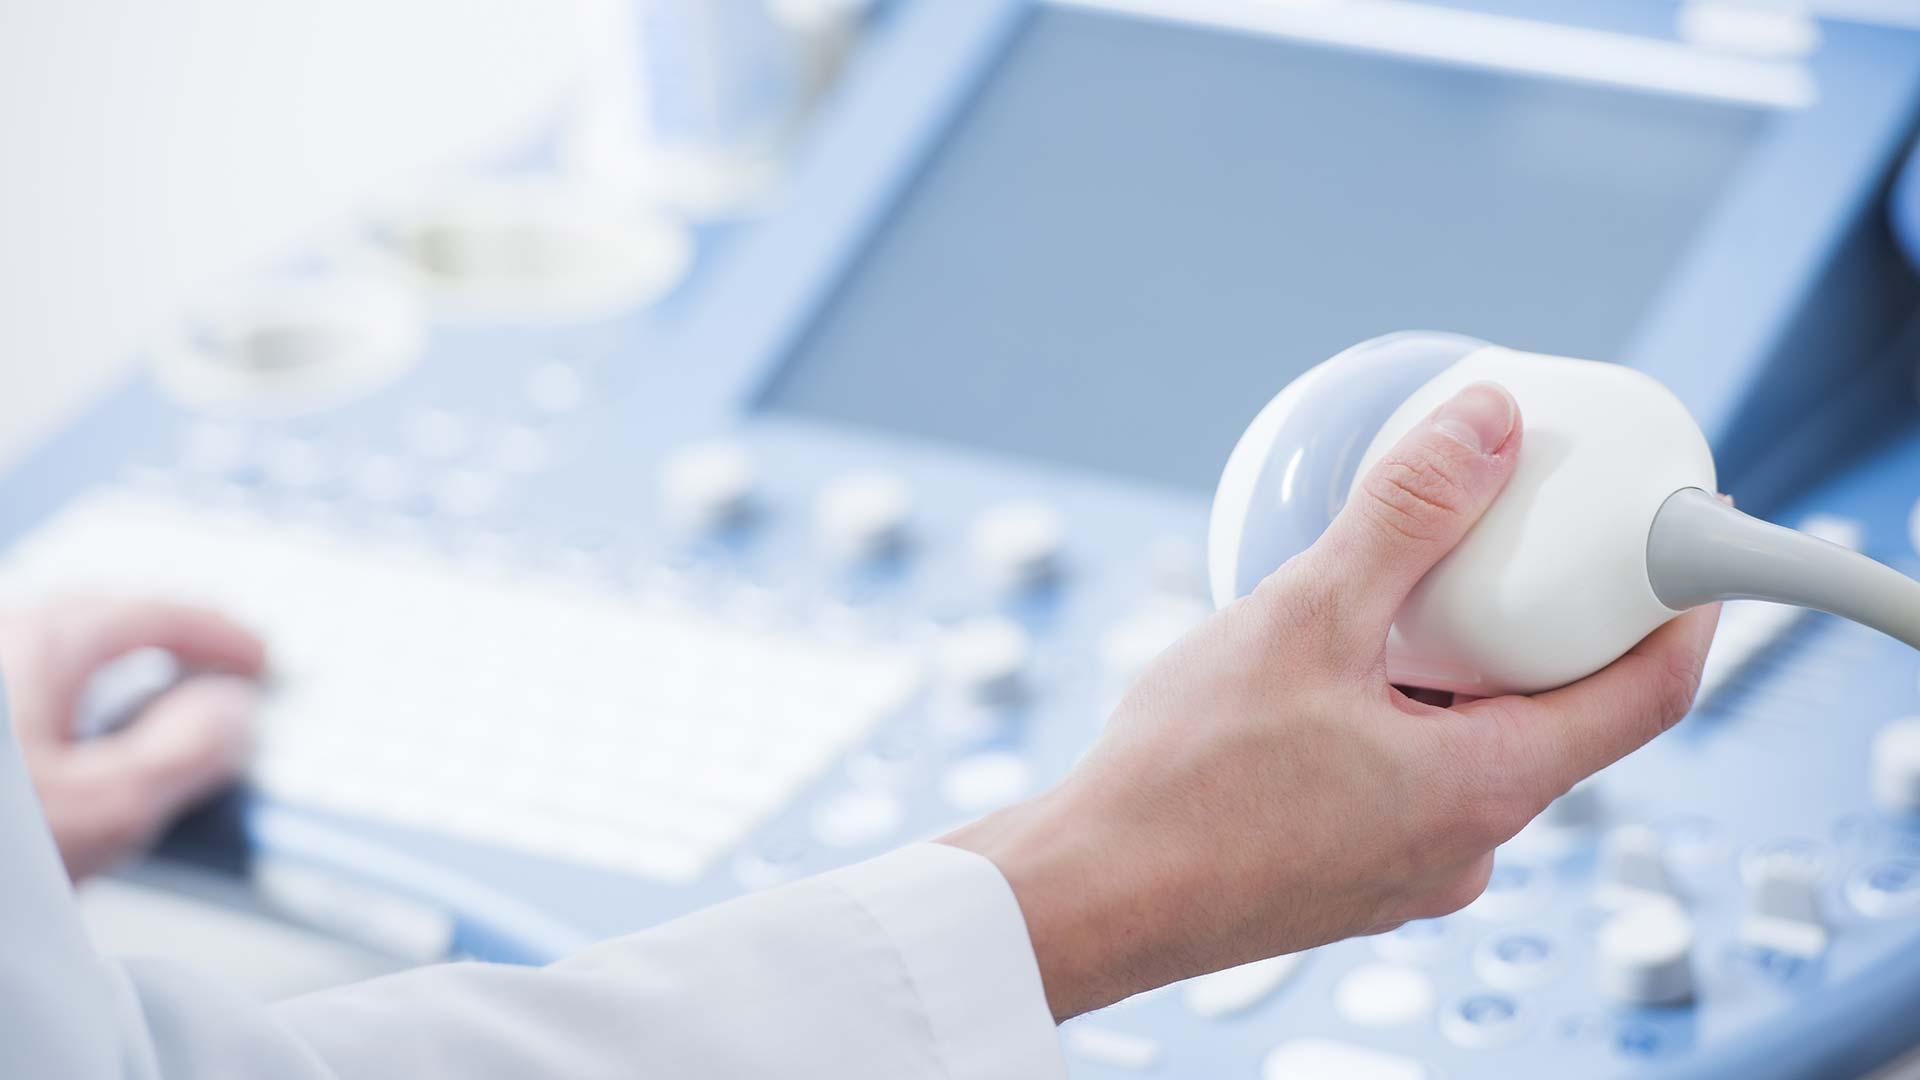 Frauenarztpraxis Semmler - Wunschleistung Gynaekologie